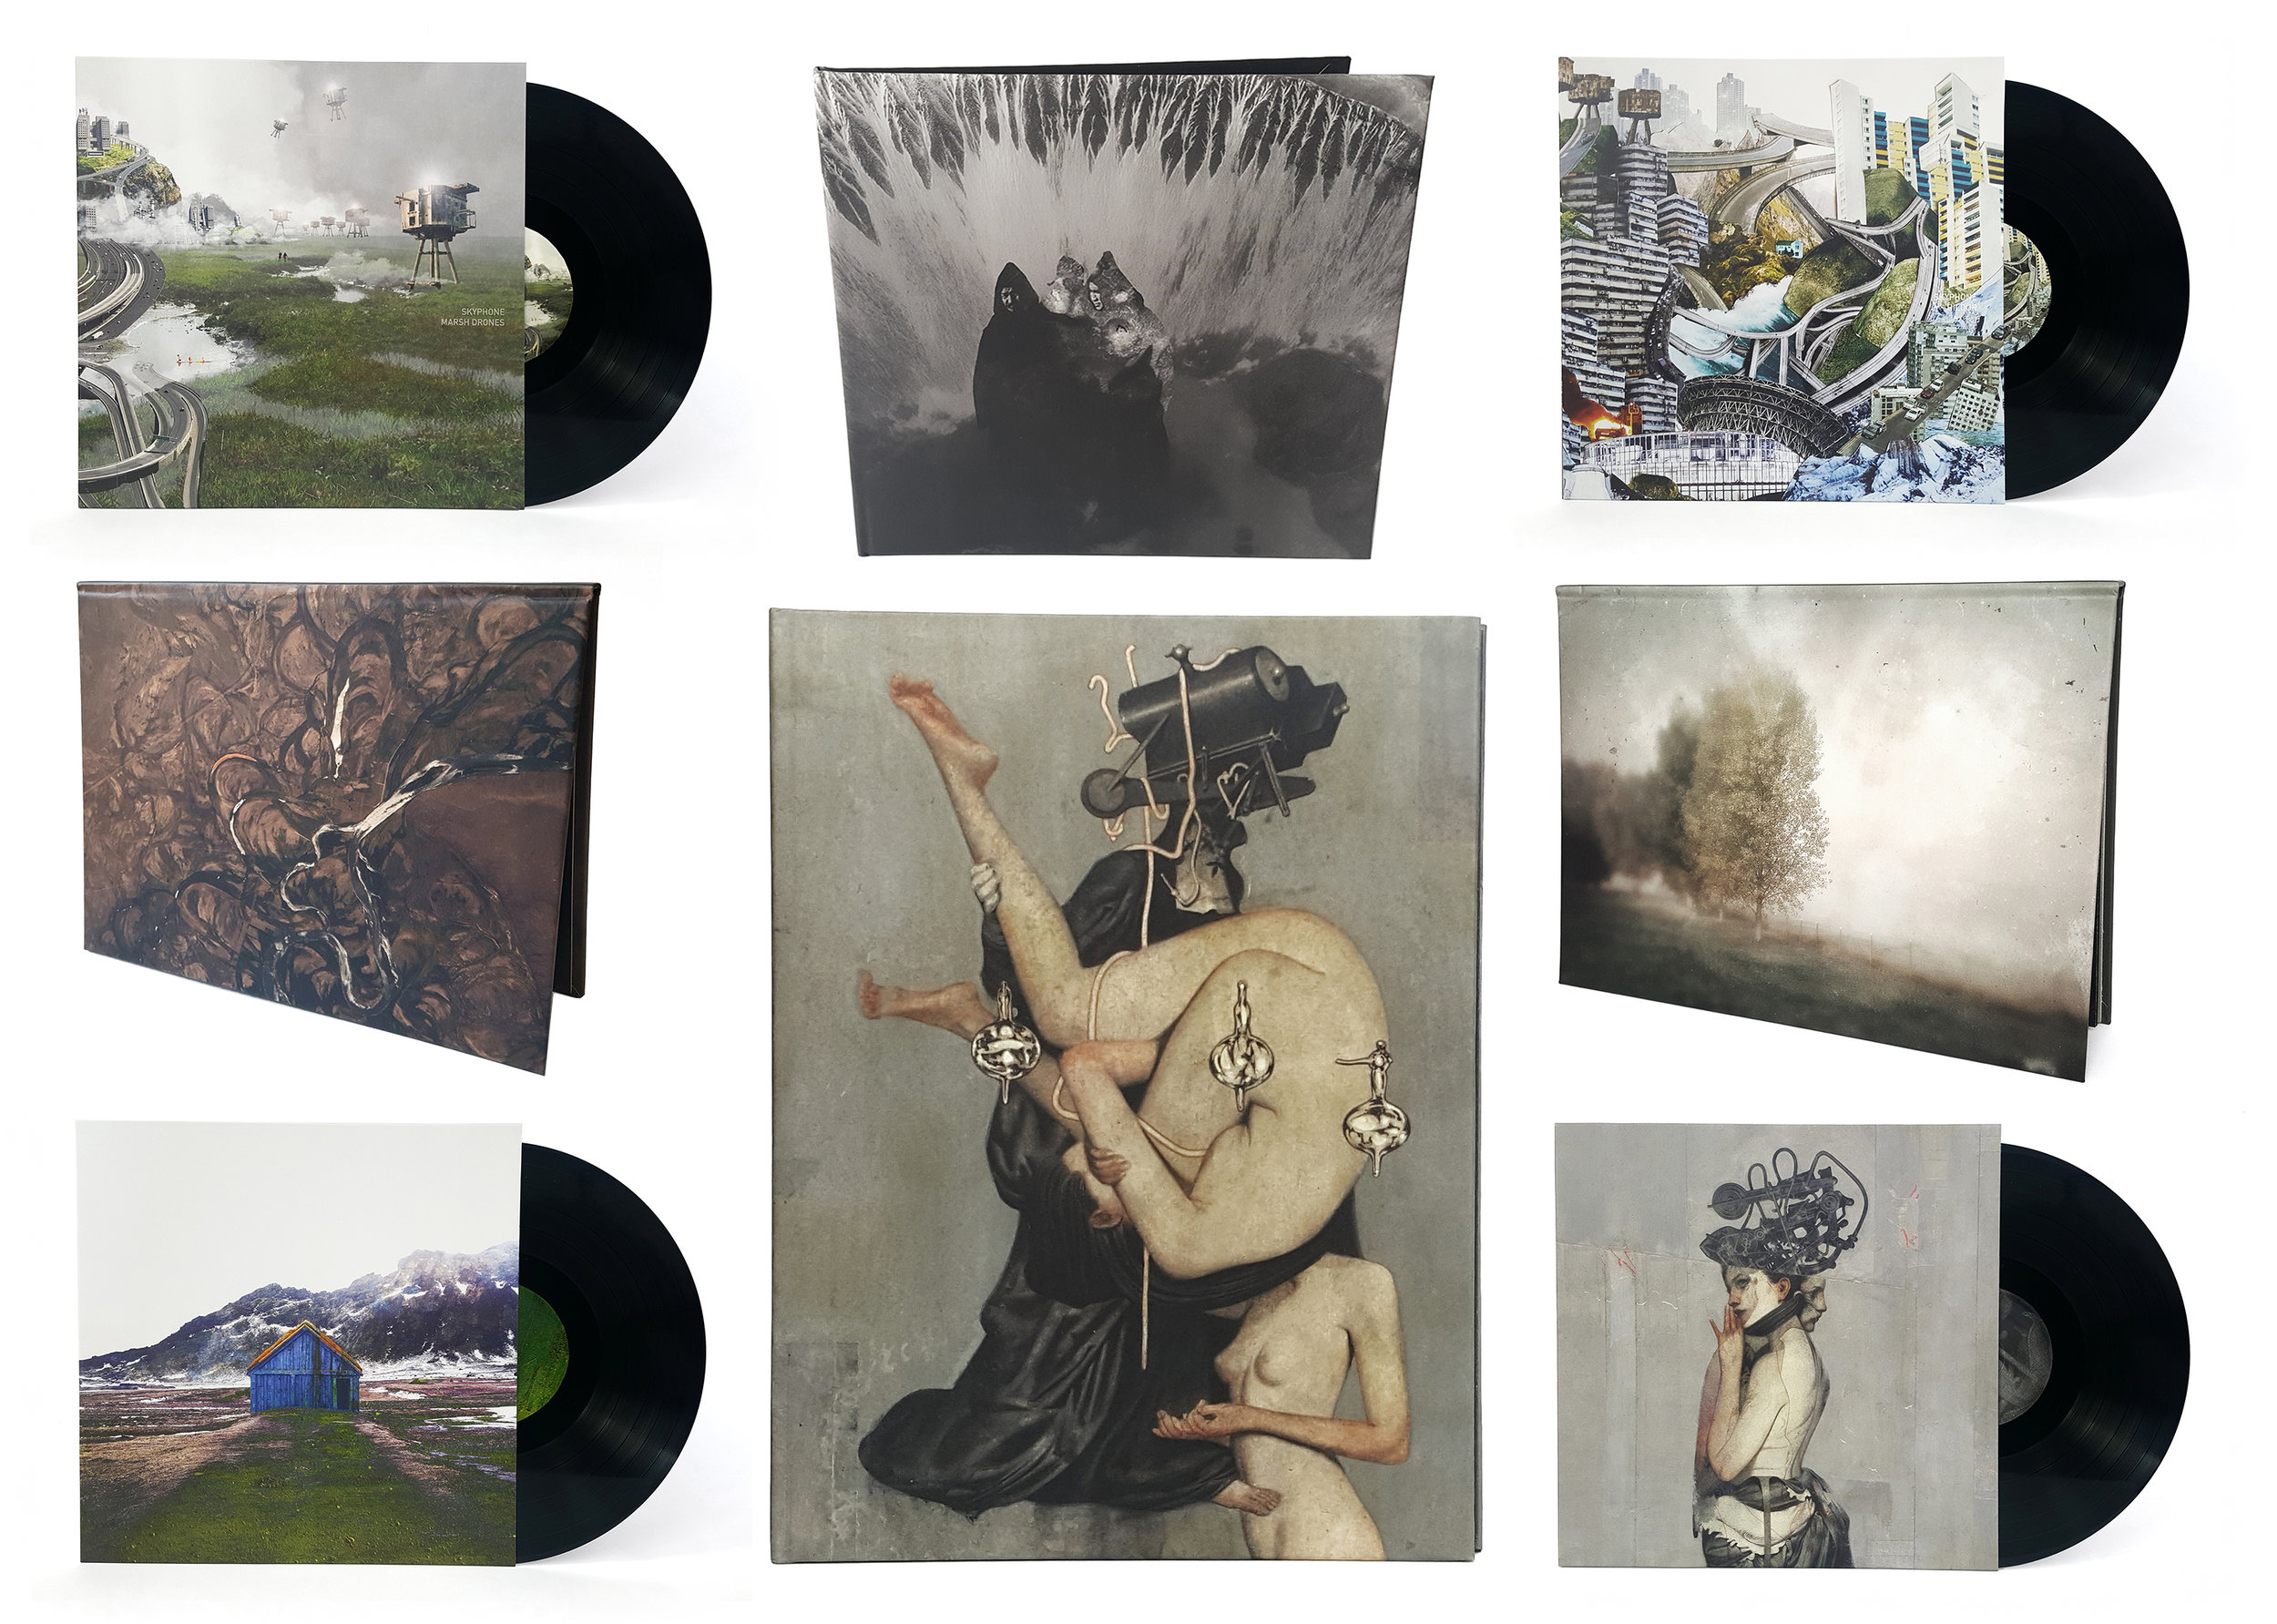 VINYL & CD BUNDLE - 4 VINYL, 4 CDS, 1 DL (25% OFF)